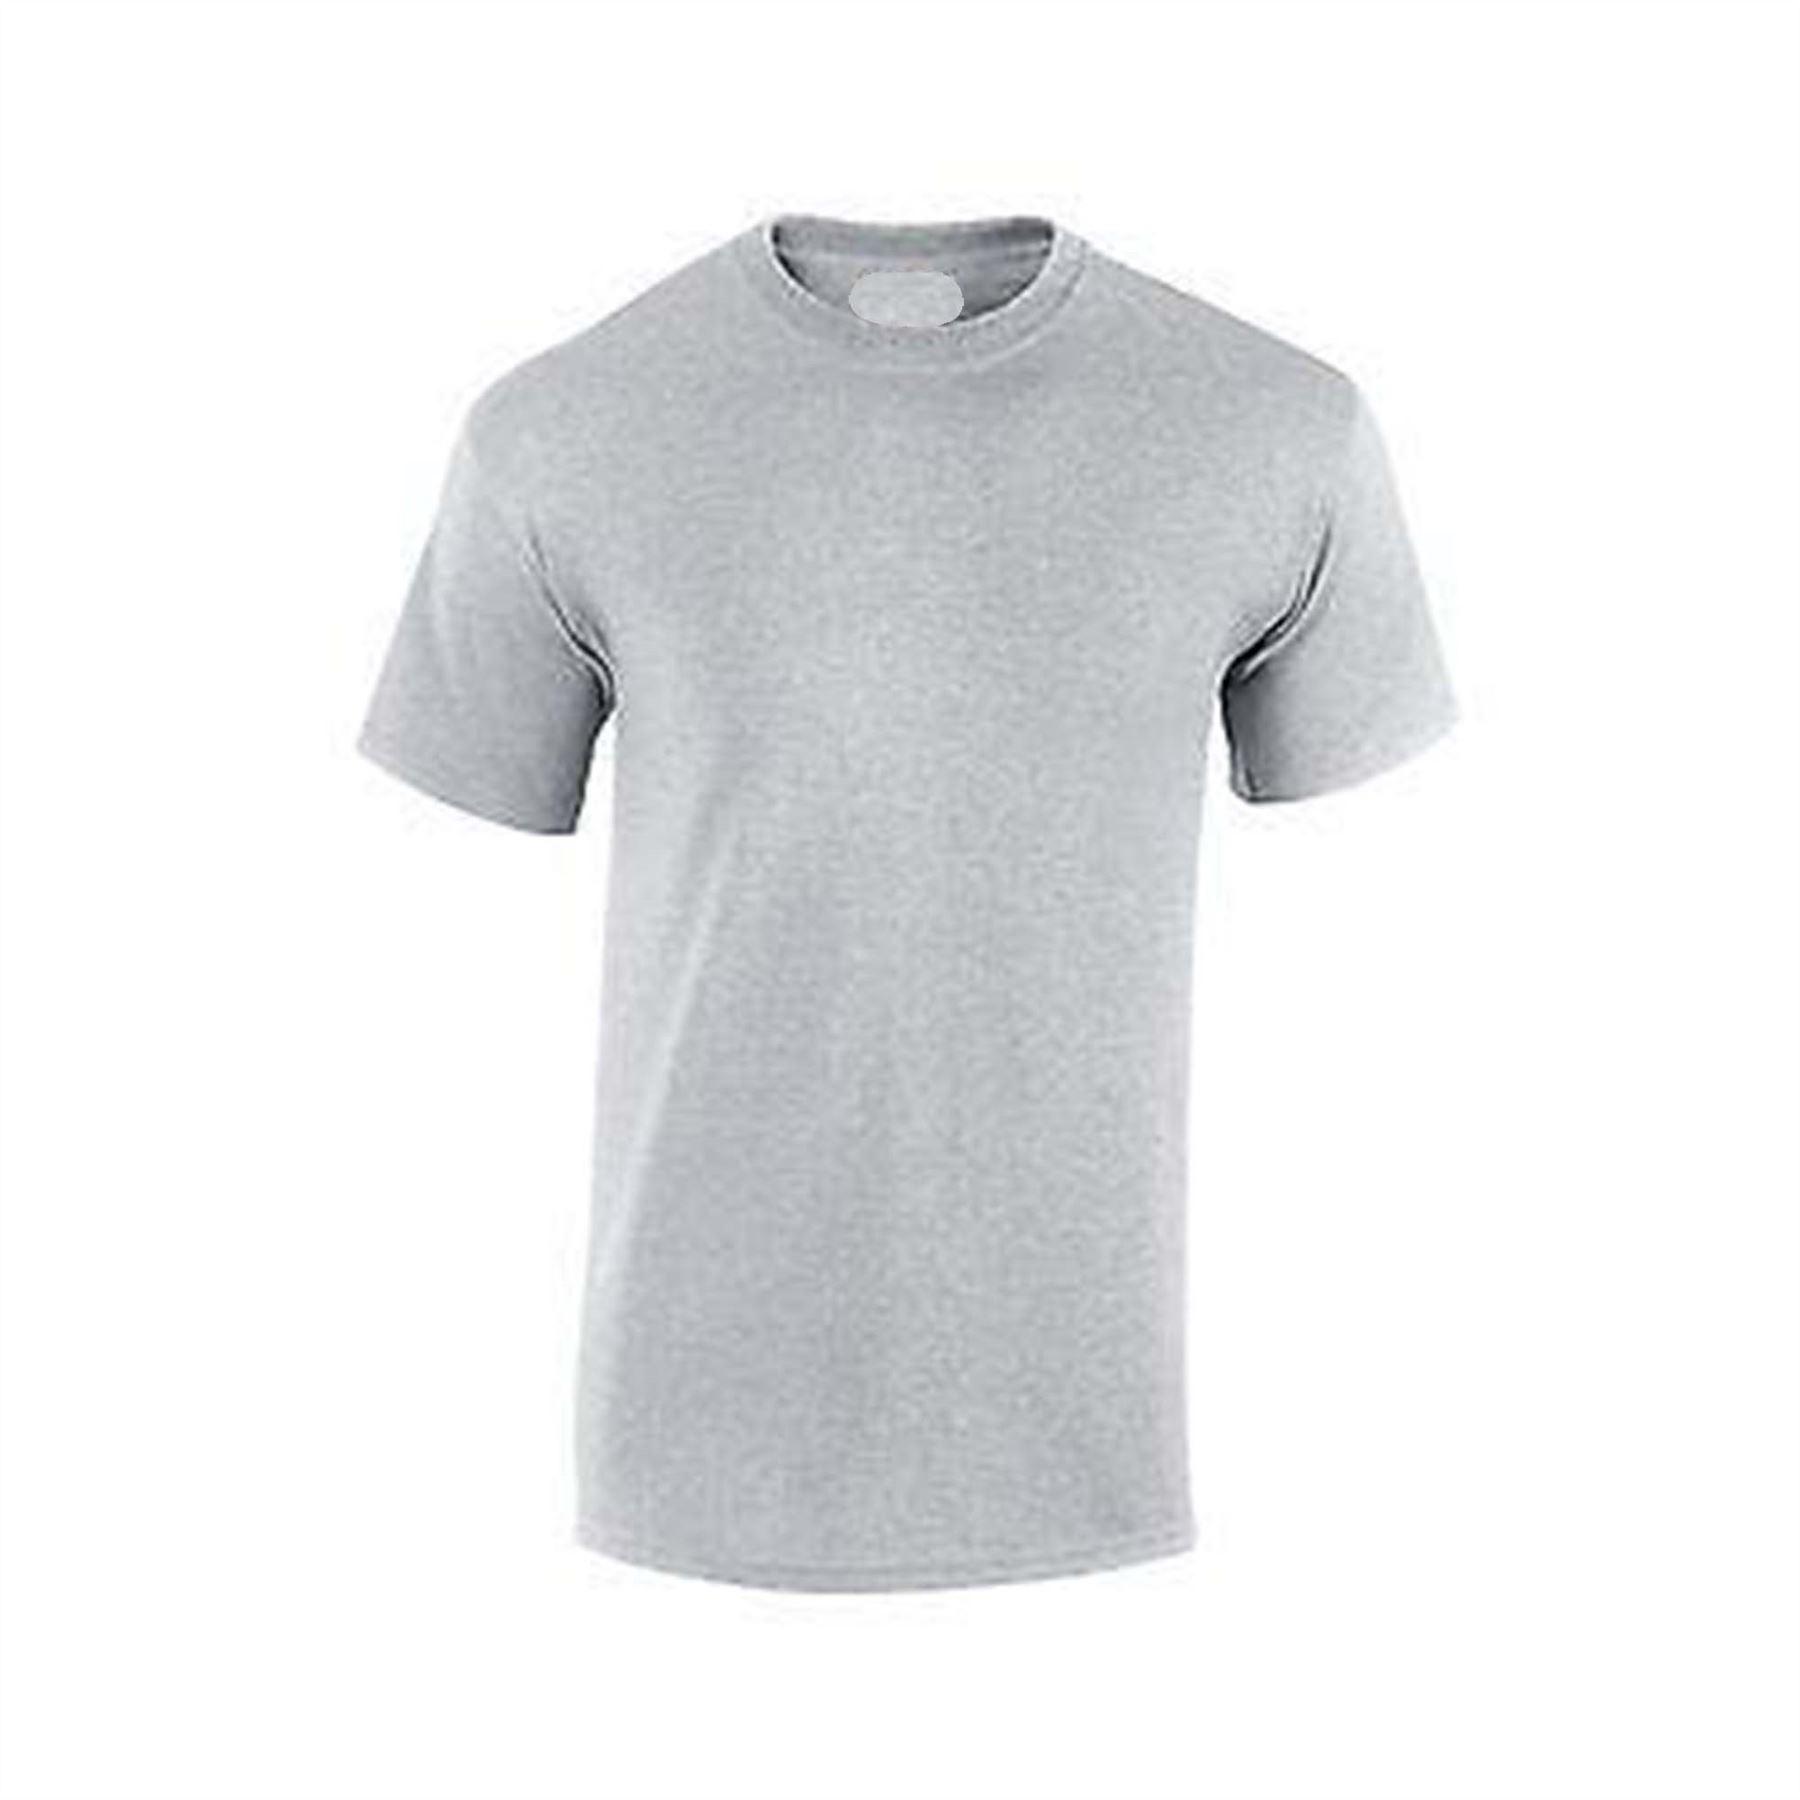 Black t shirt blank - Men 039 S Polo Shirt Plain T Shirt